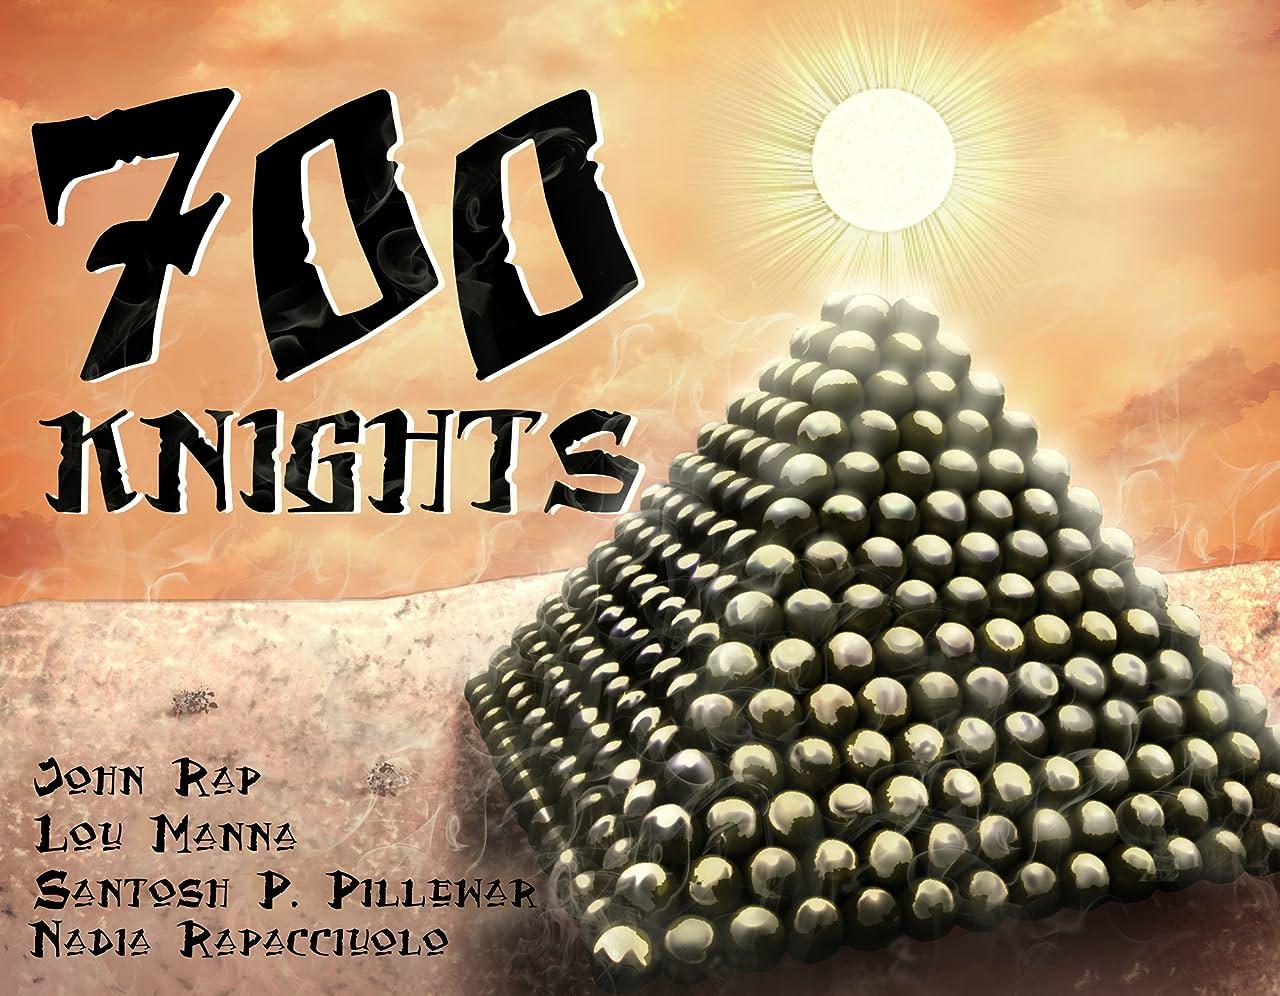 700 Knights #1